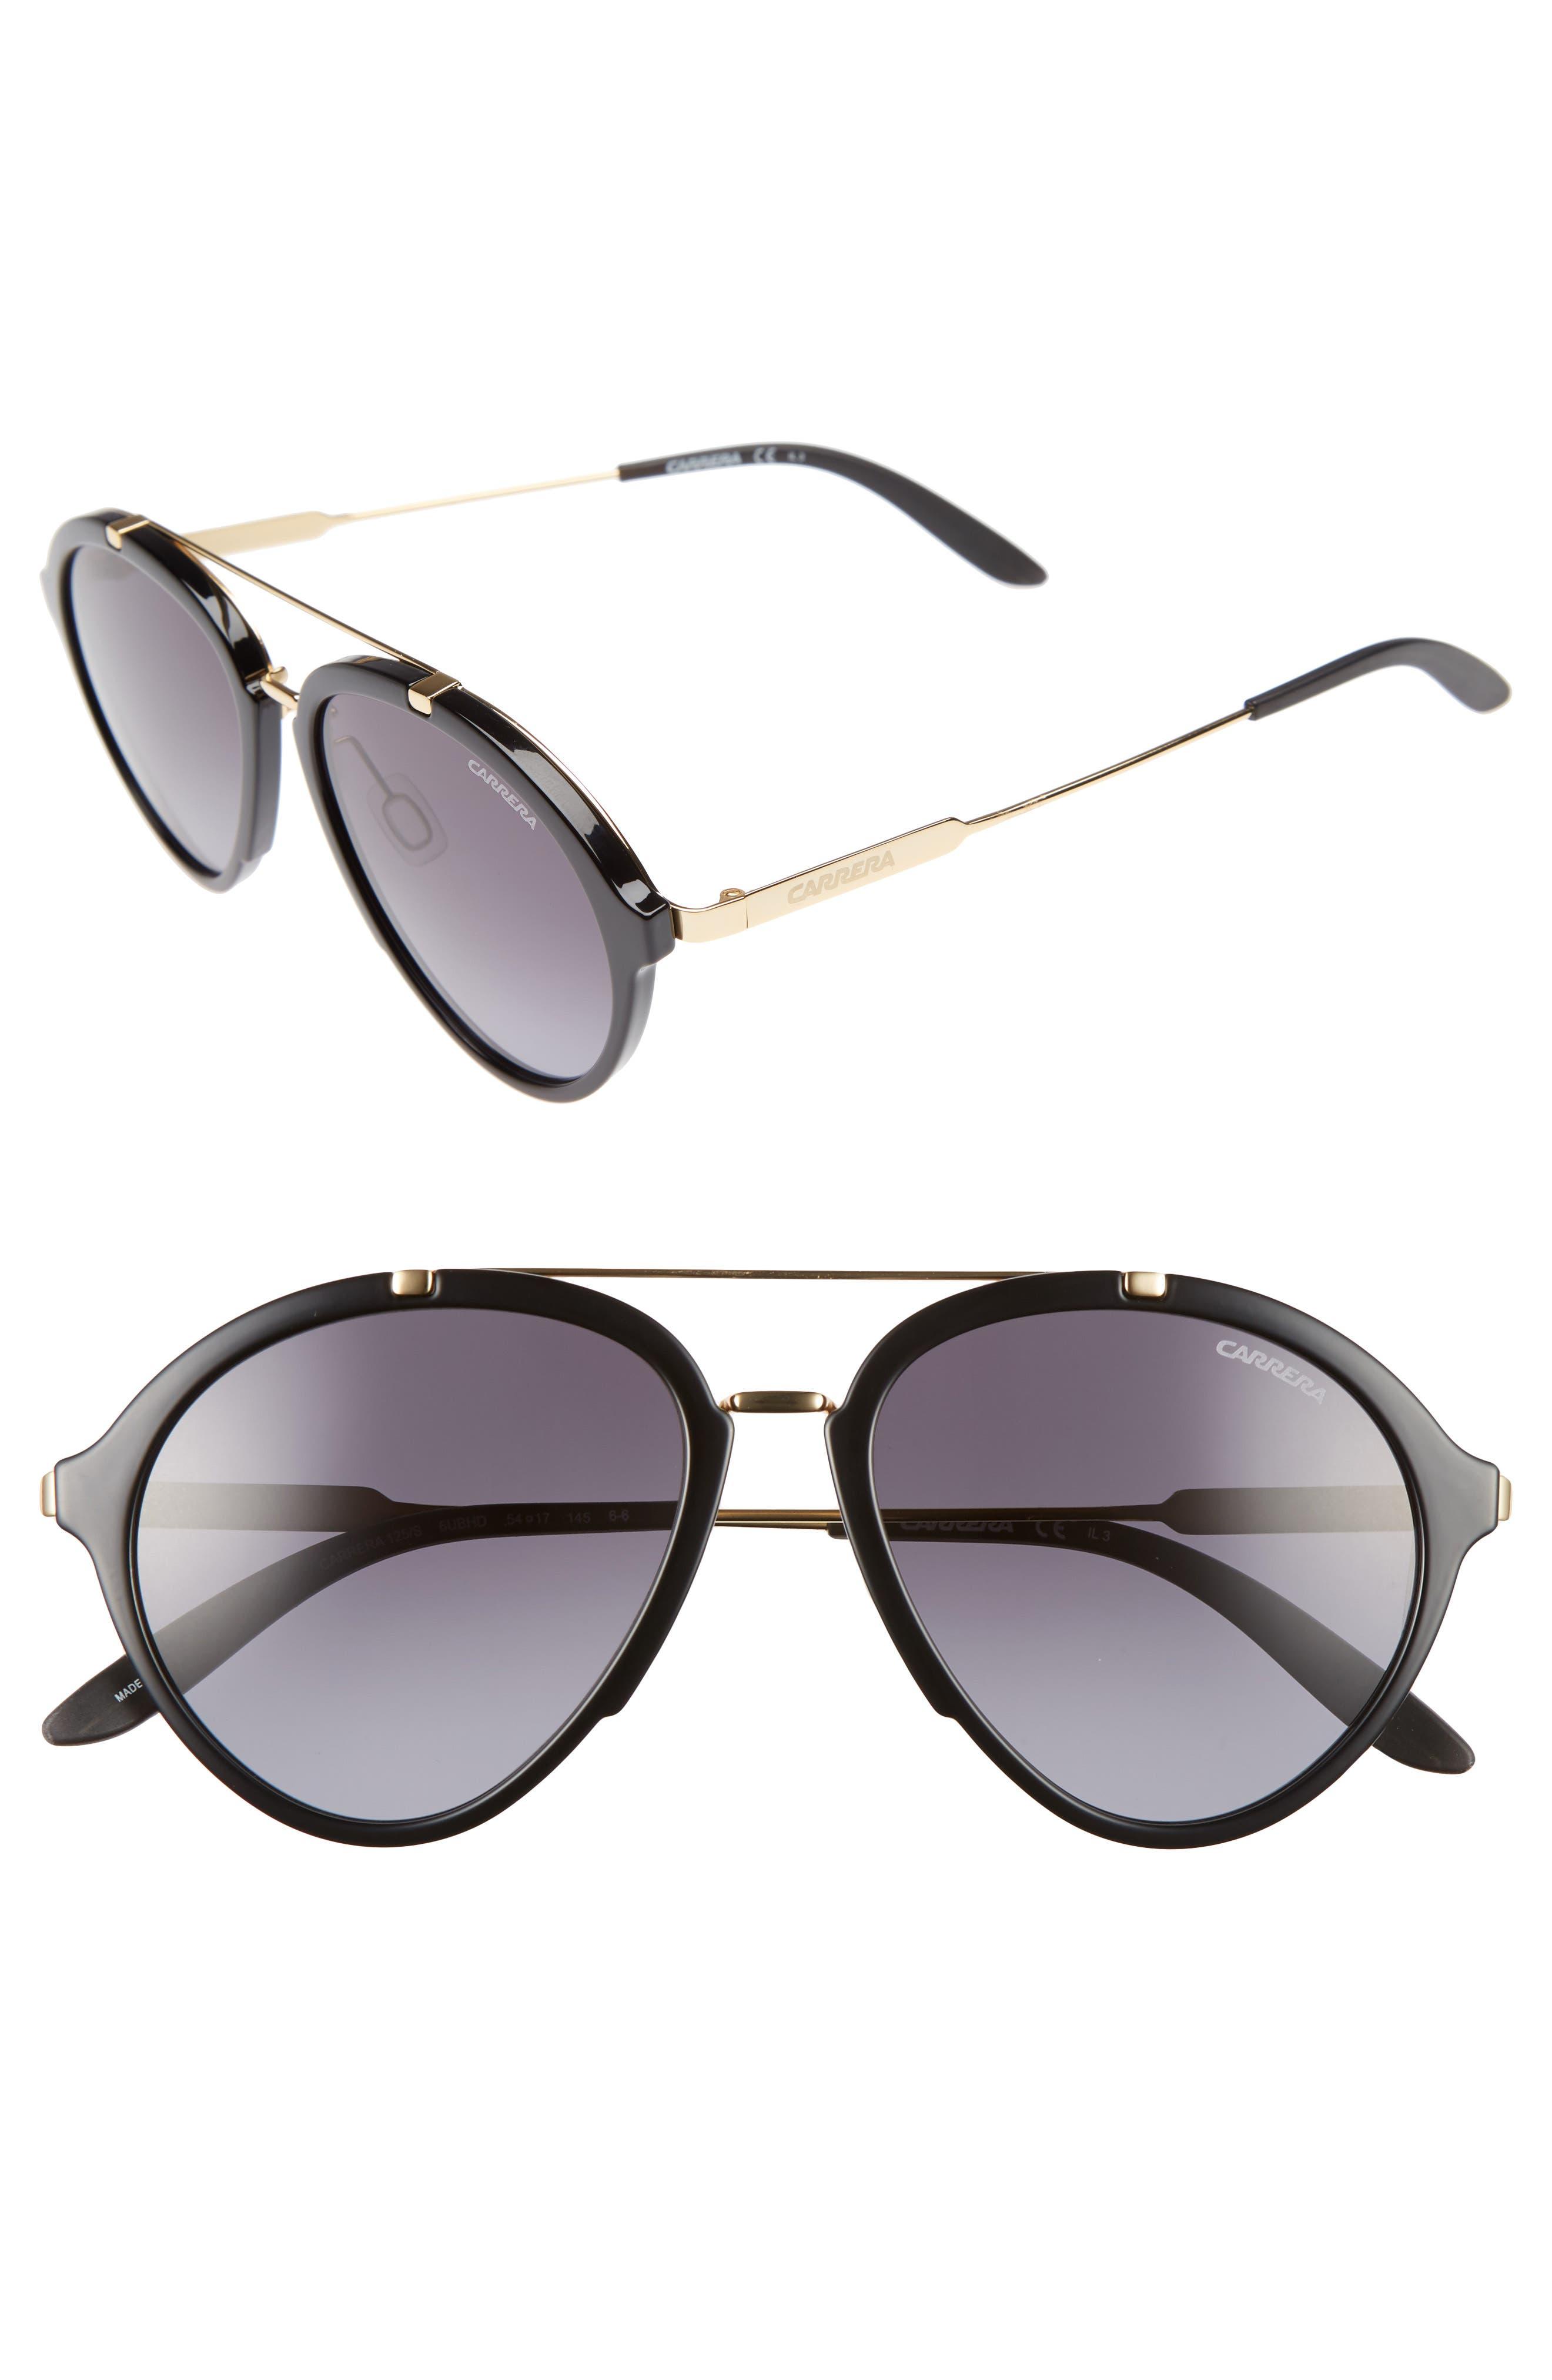 54mm Gradient Aviator Sunglasses,                         Main,                         color, 001